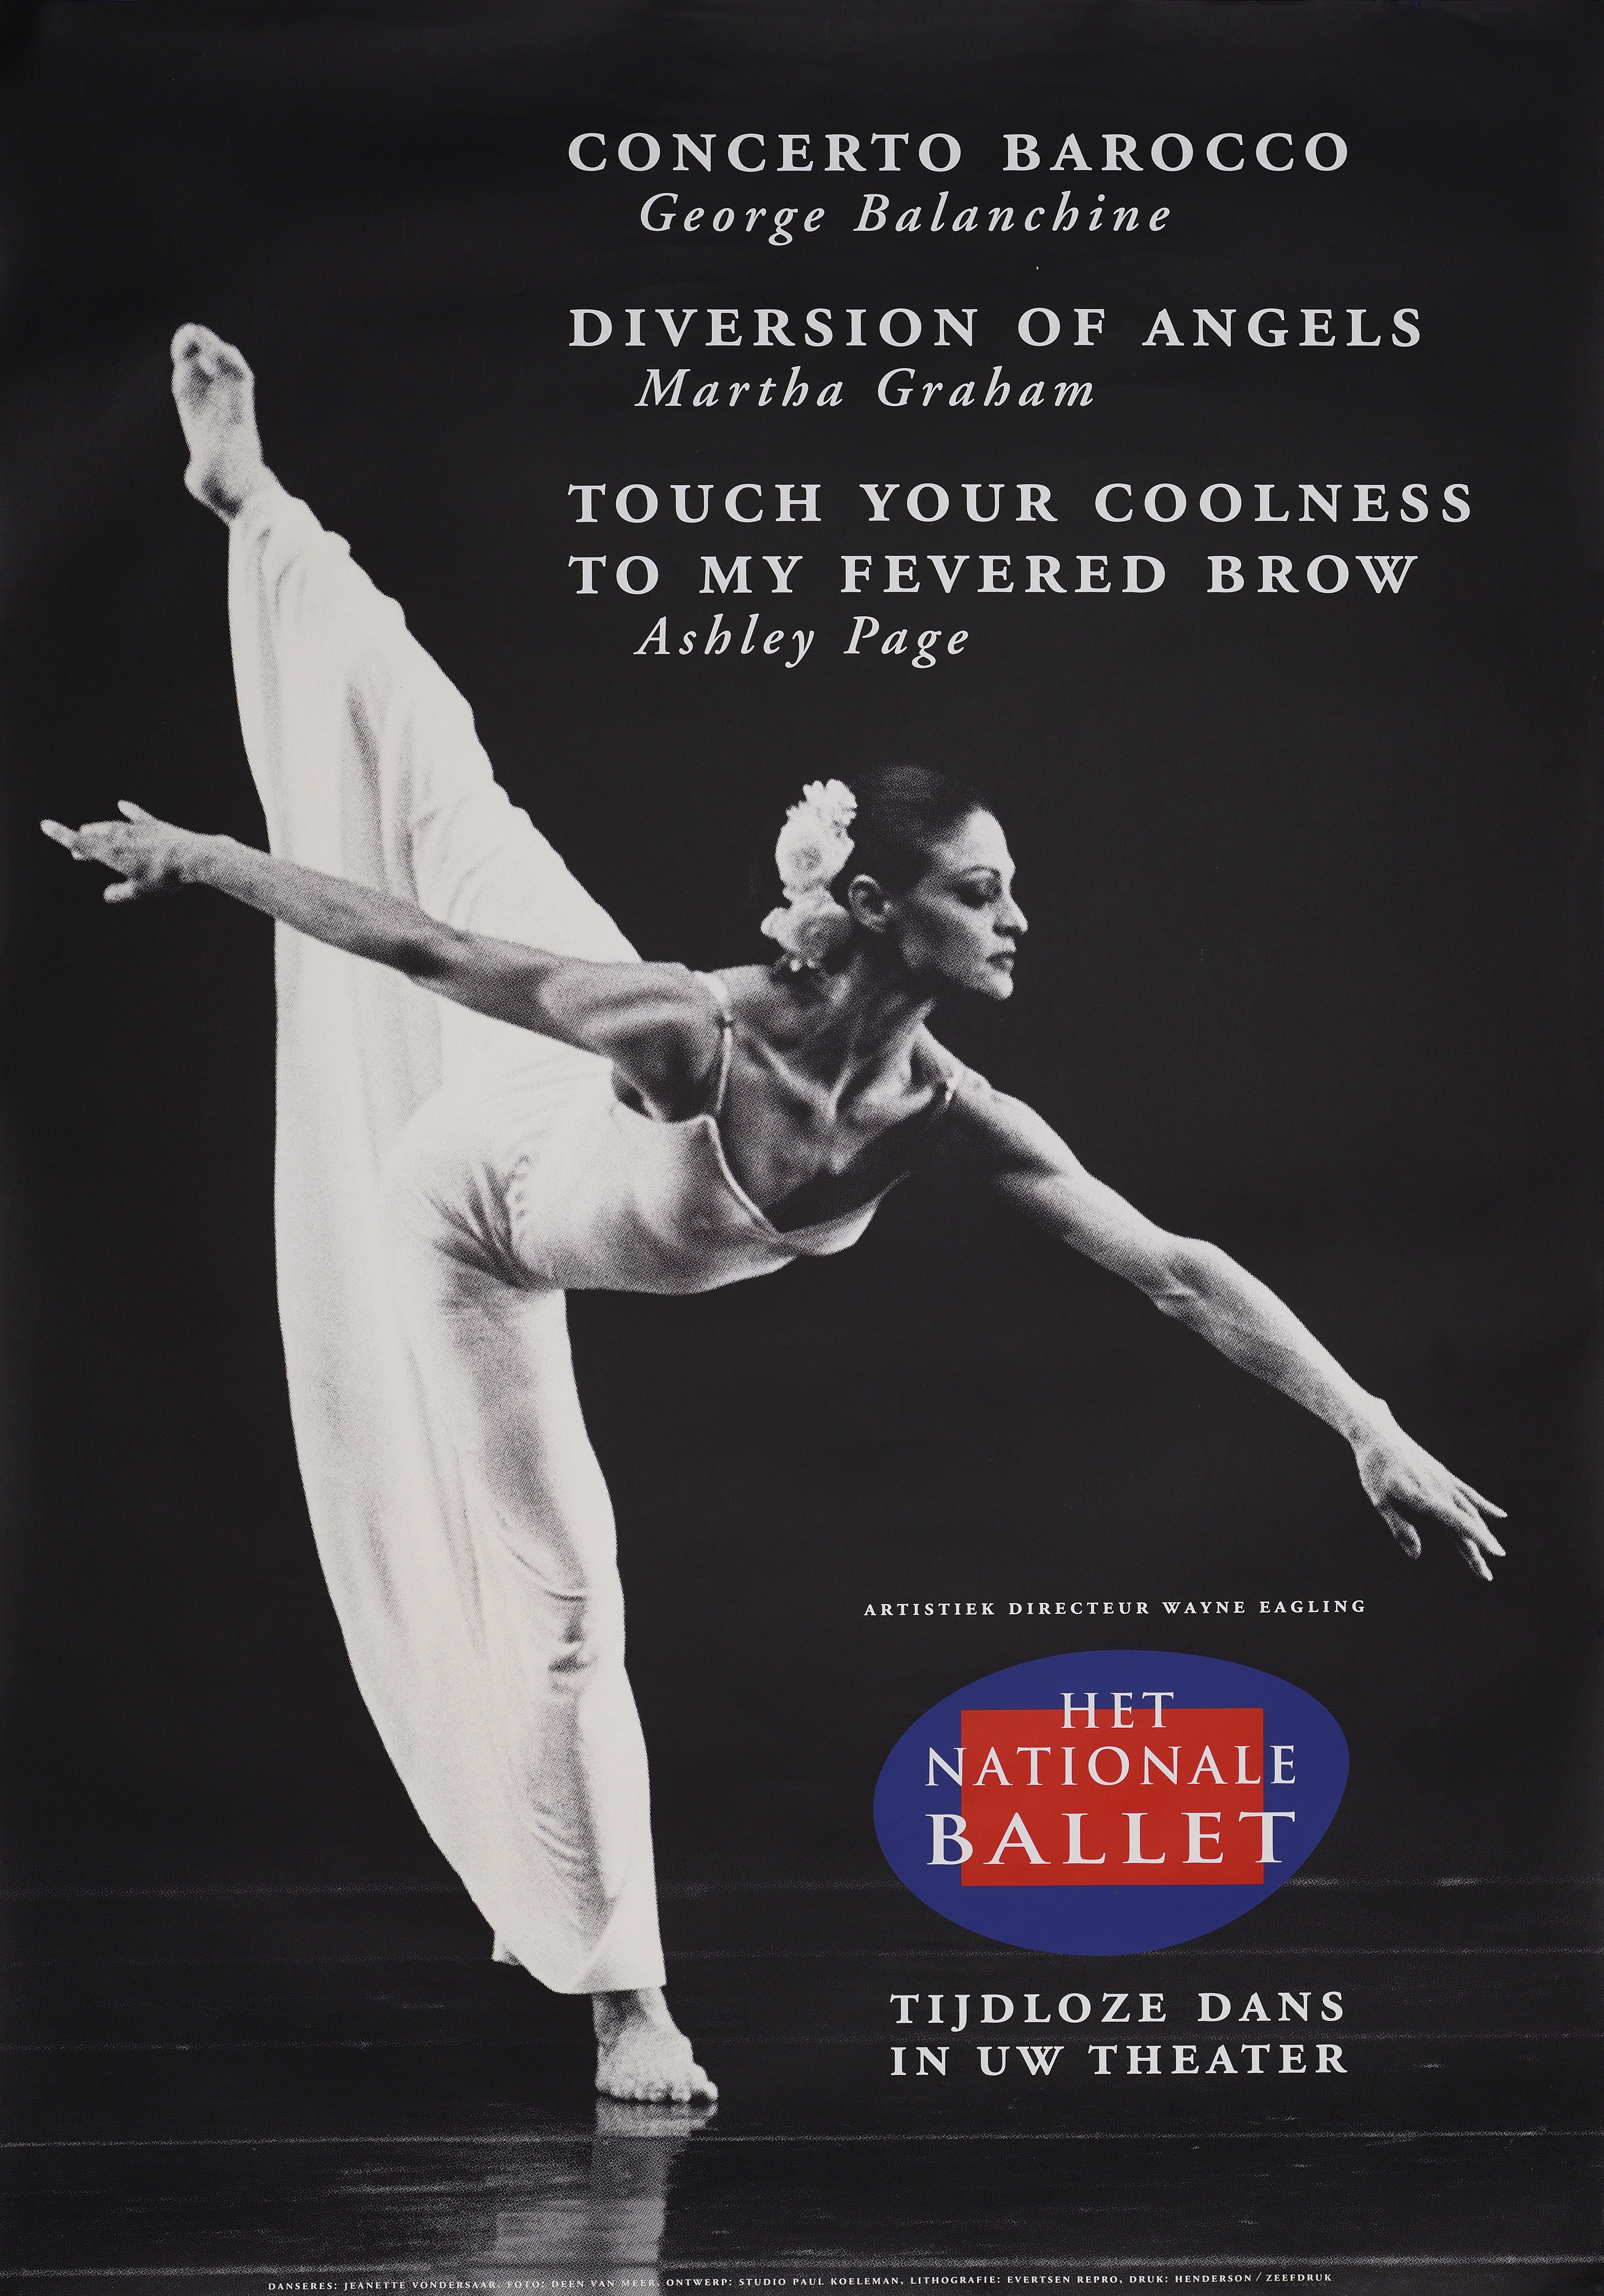 Affiche - Het Nationale Ballet - Concerto Barocco